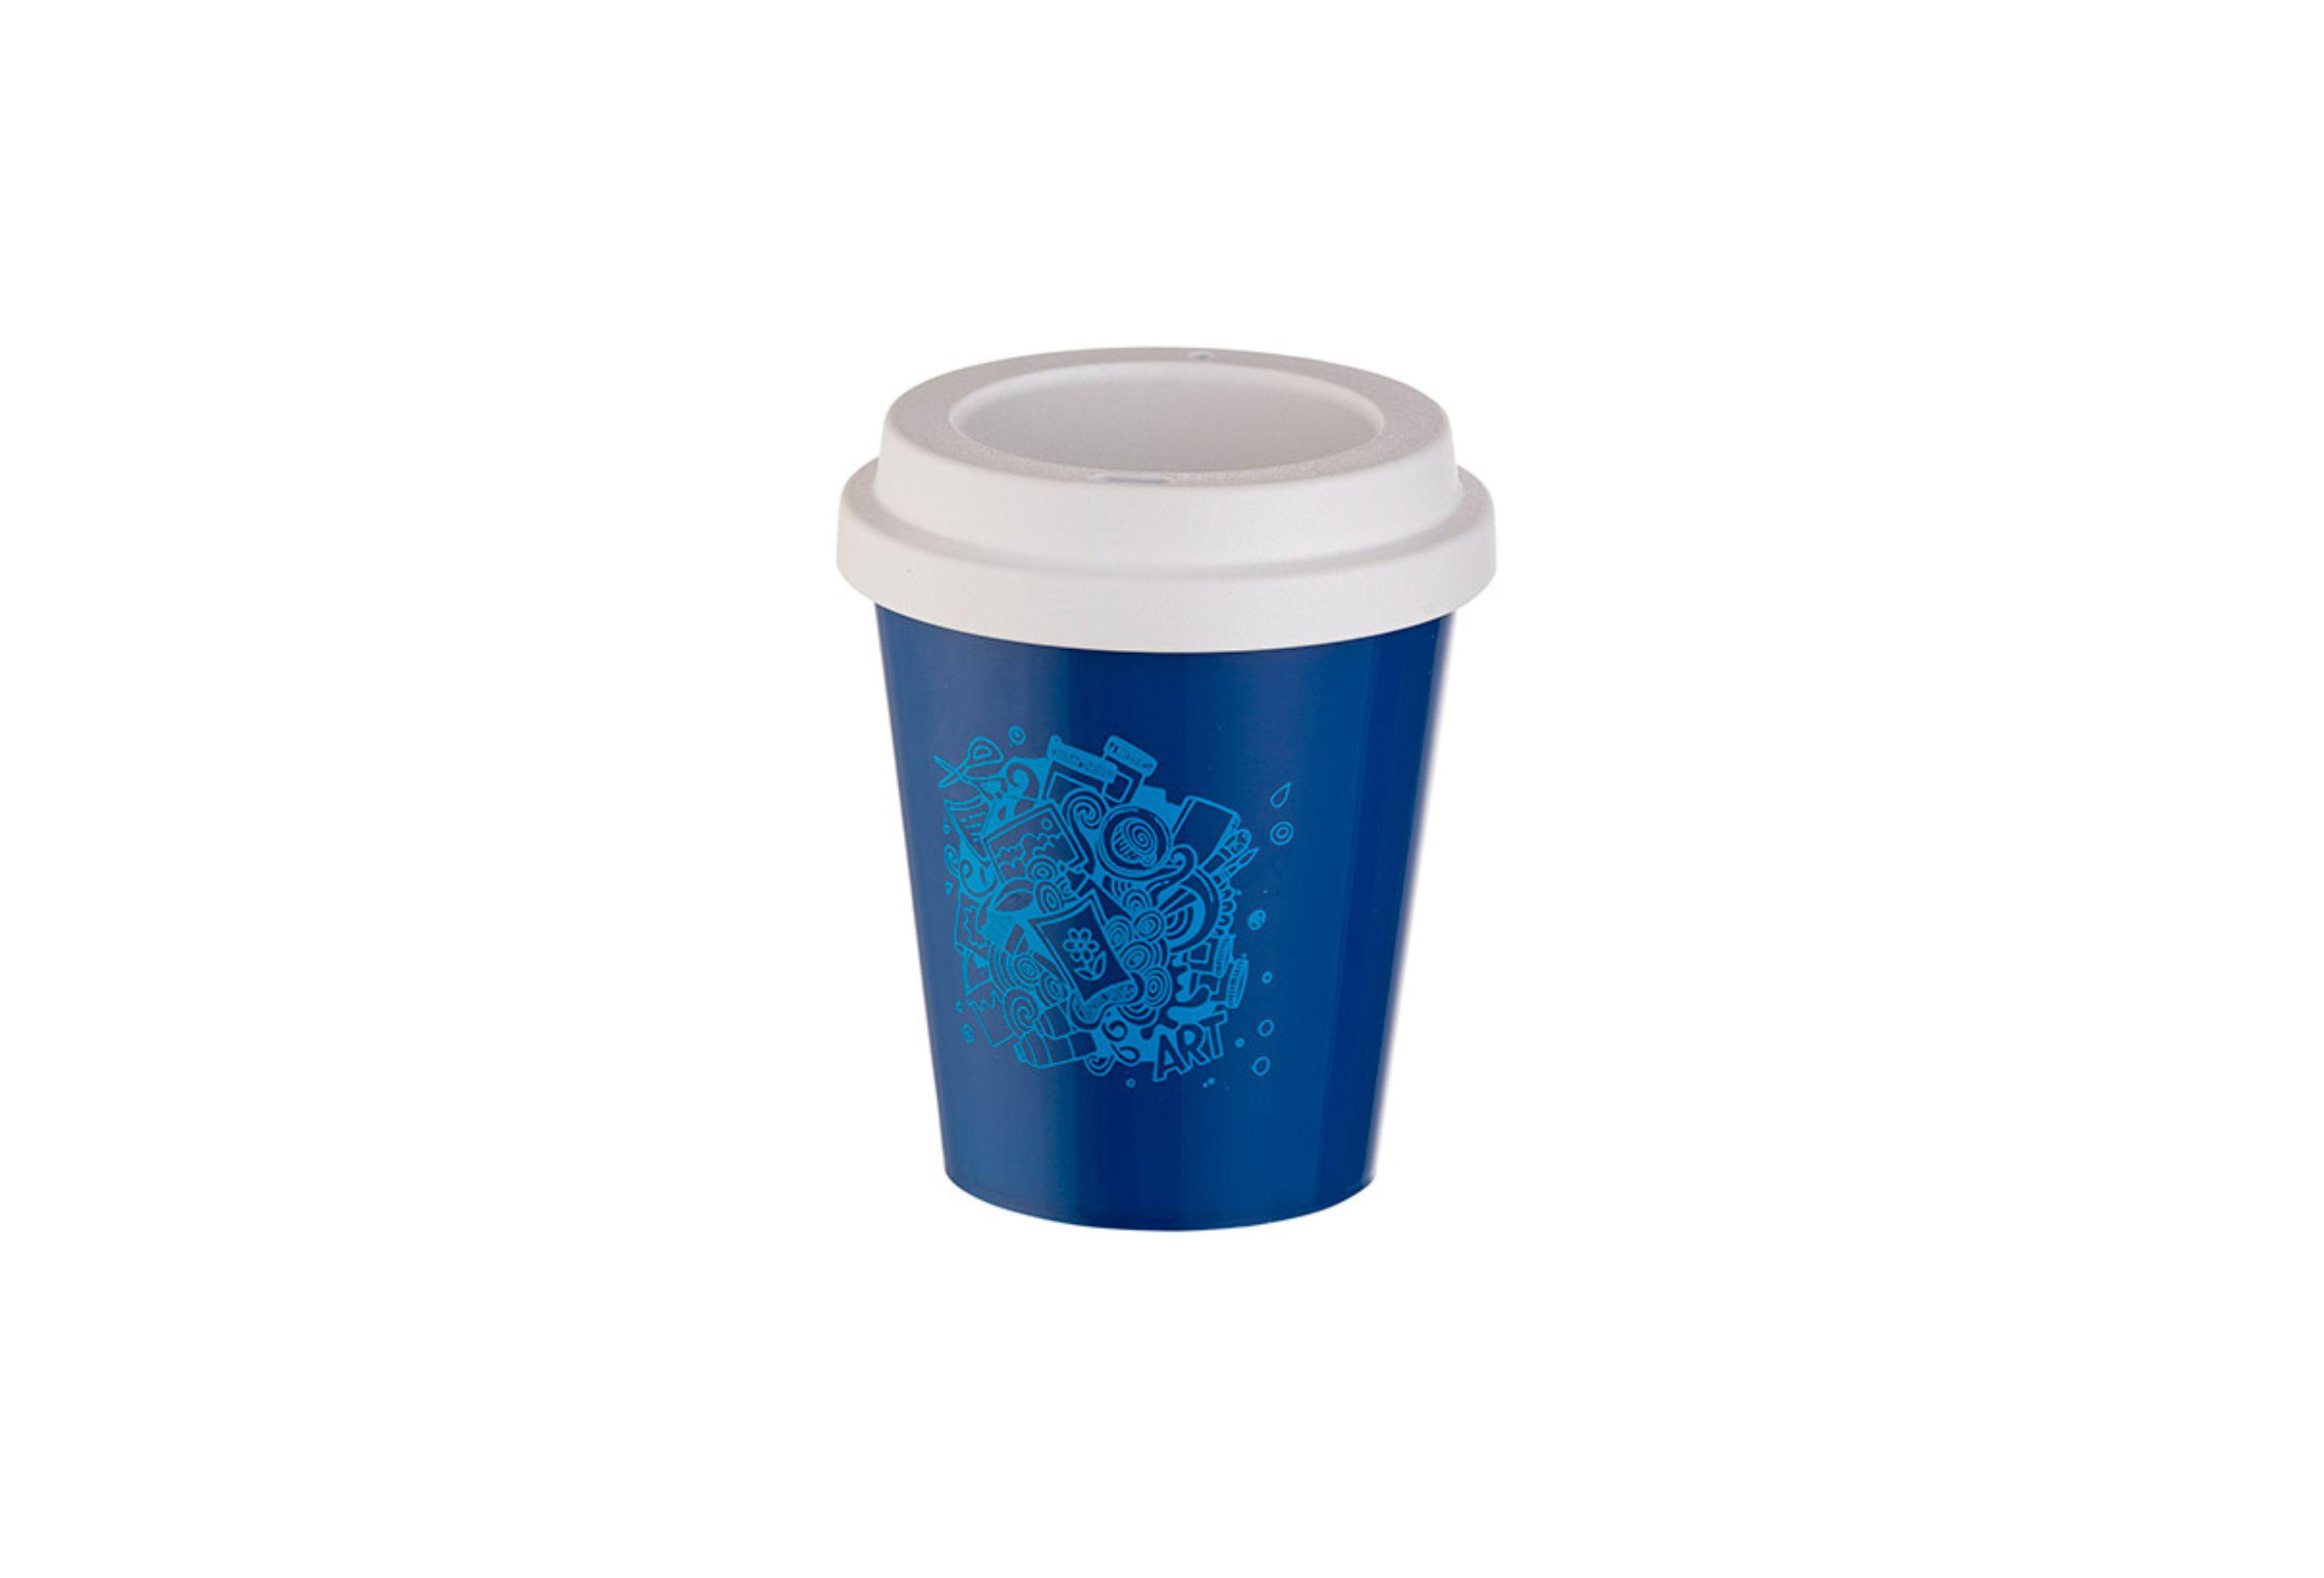 ABCP350 – Copo para suco e café – Promocional